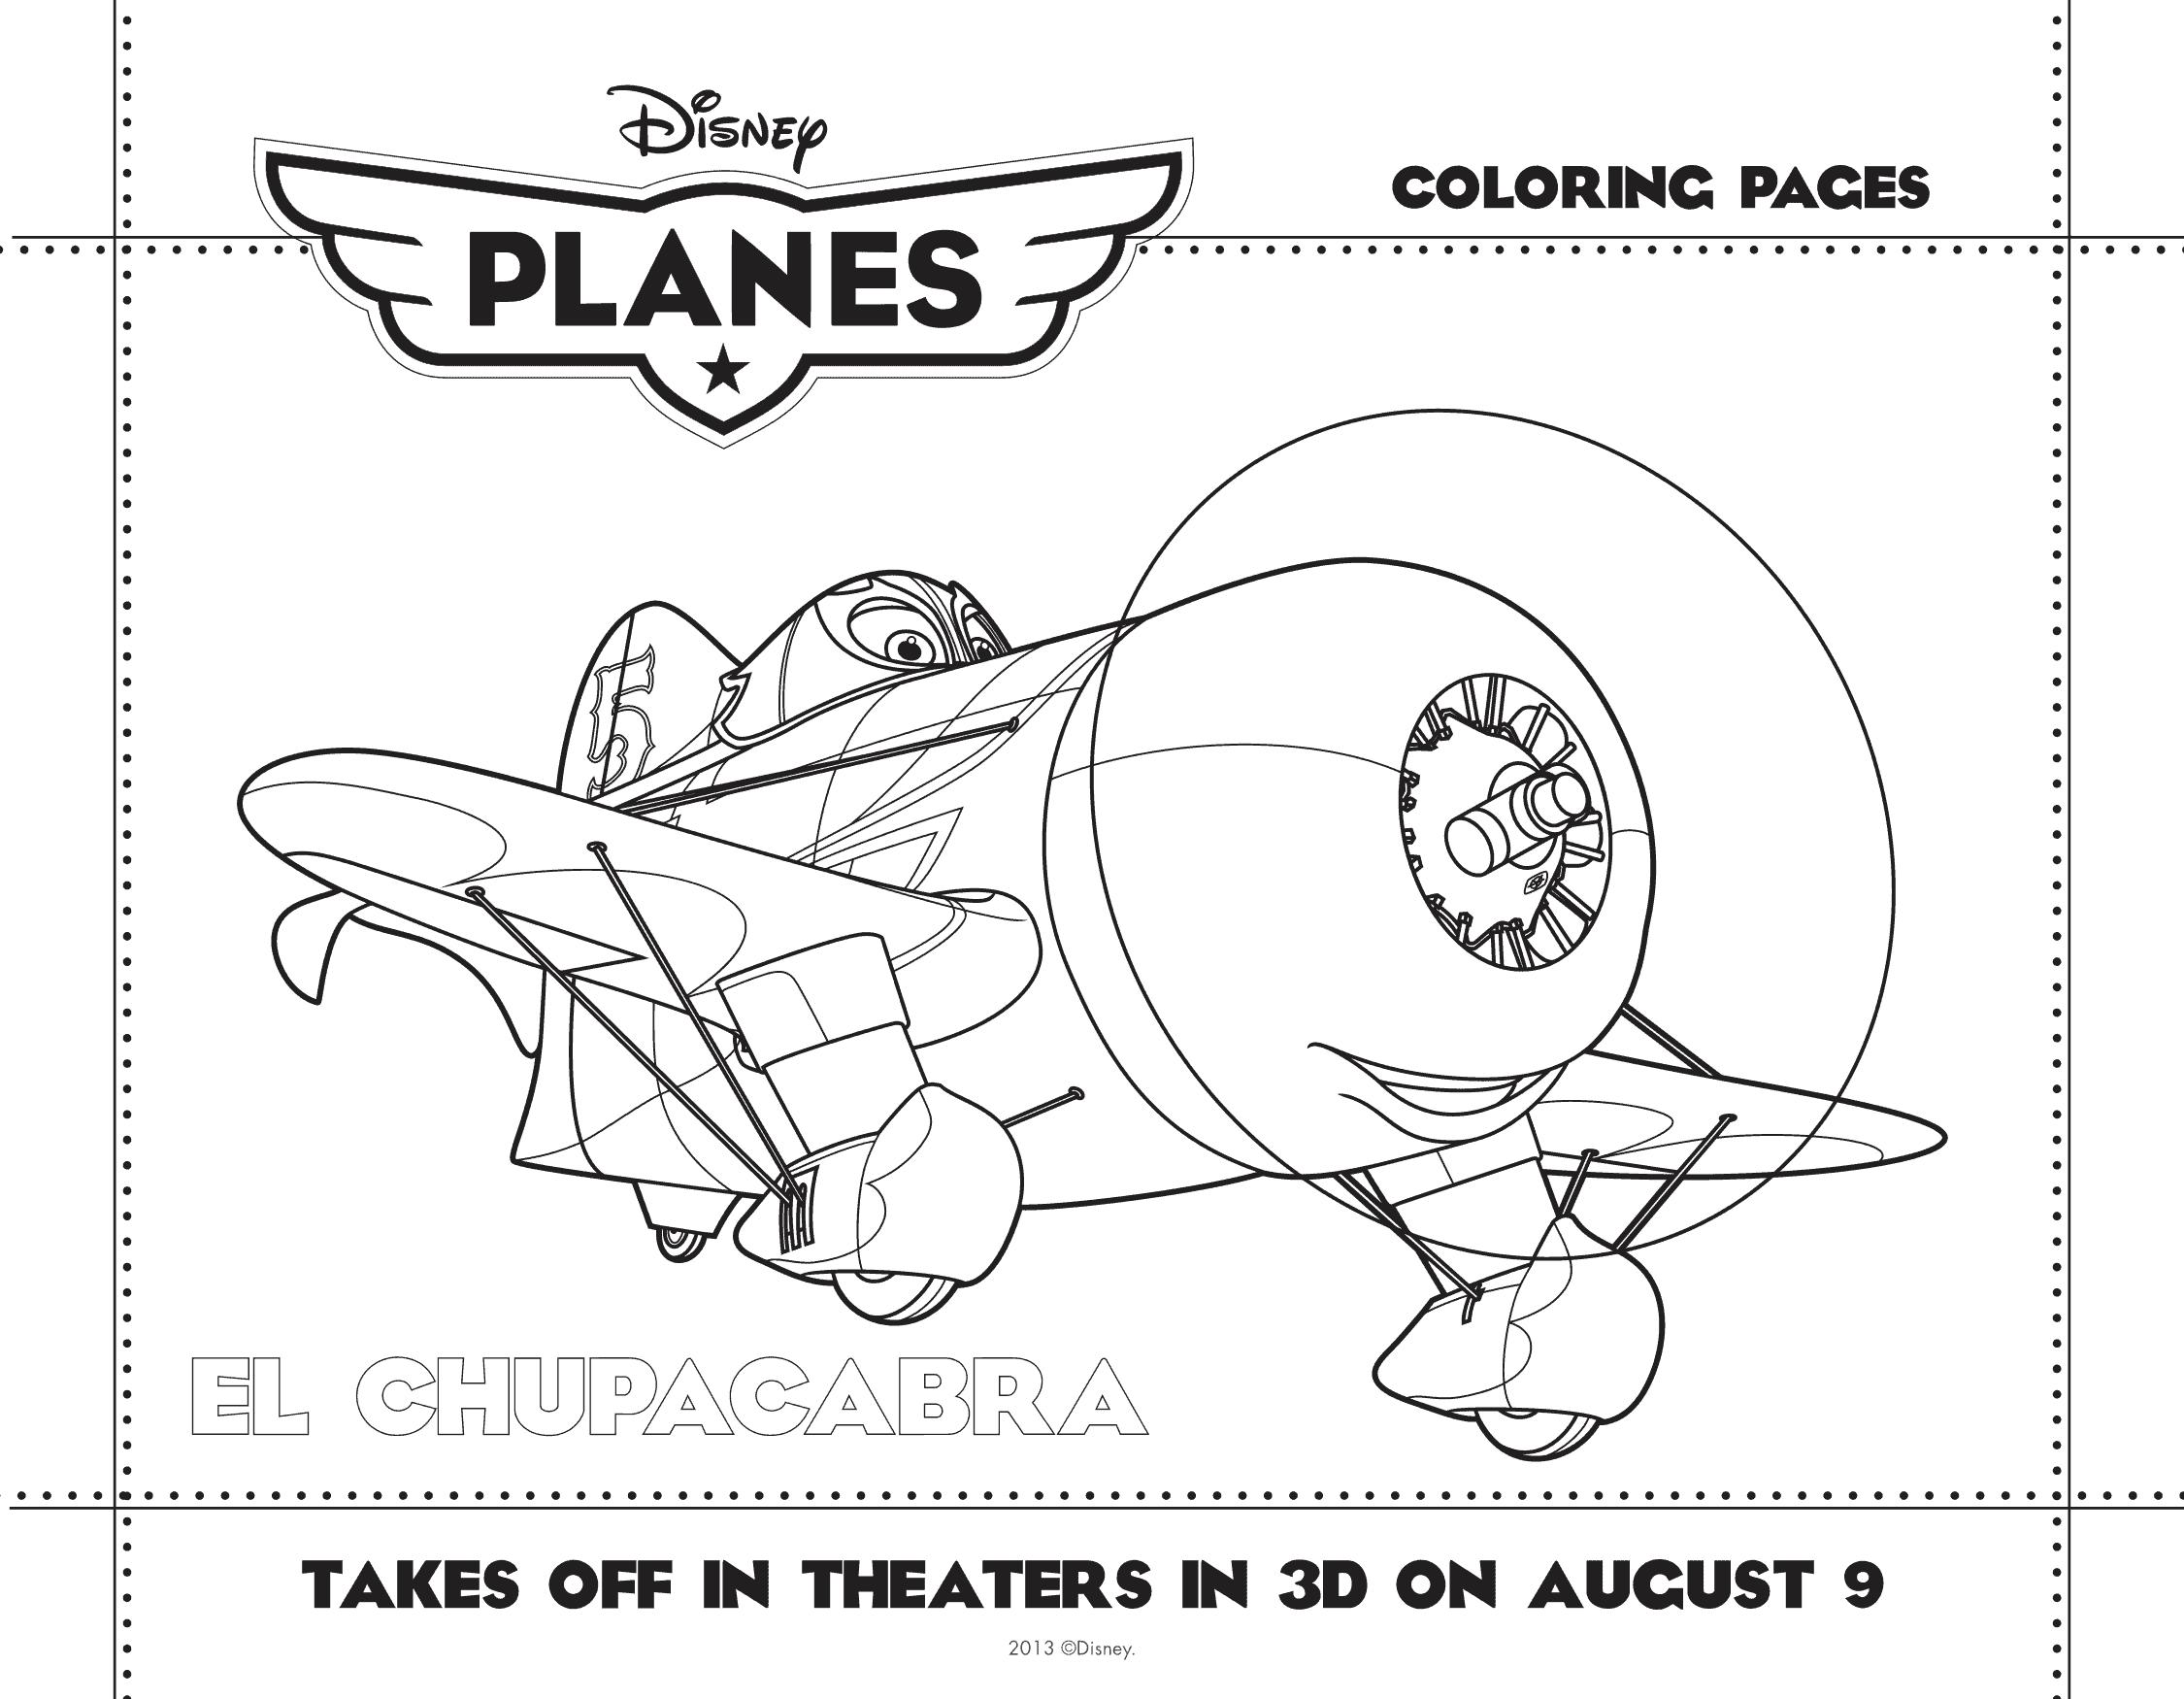 PLANES coloring sheet 2